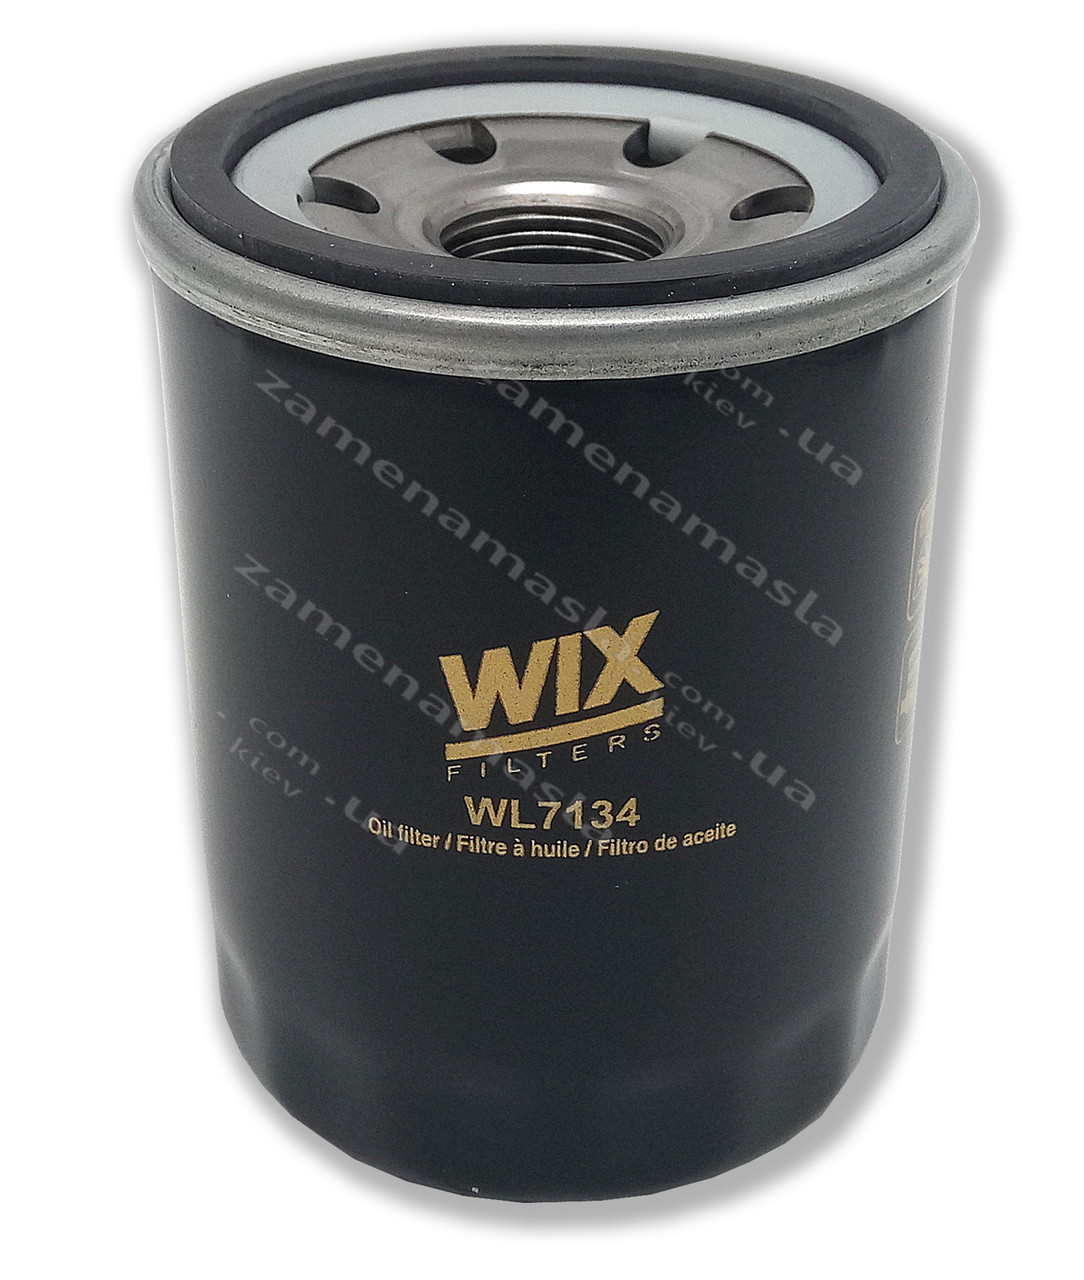 WIX WL7134 аналог SM-104 на Ford; Honda; Hyundai; Kia; Mazda; Mitsubishi; Nissan; Opel; Peugeot